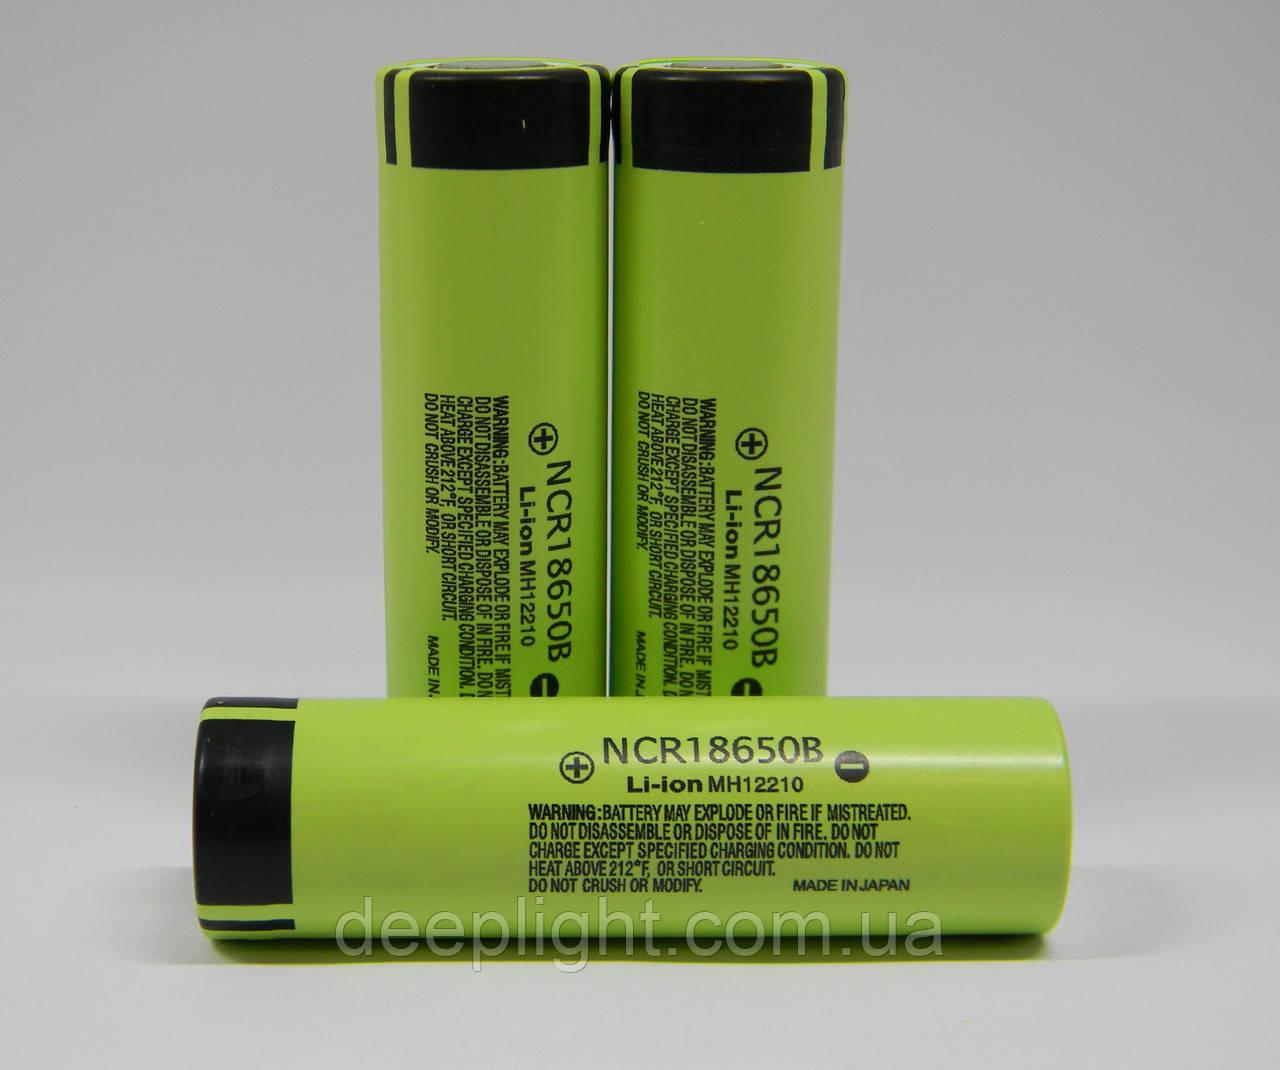 Акумулятори Panasonic (liitokala) 18650 3400 mAh без плати захисту